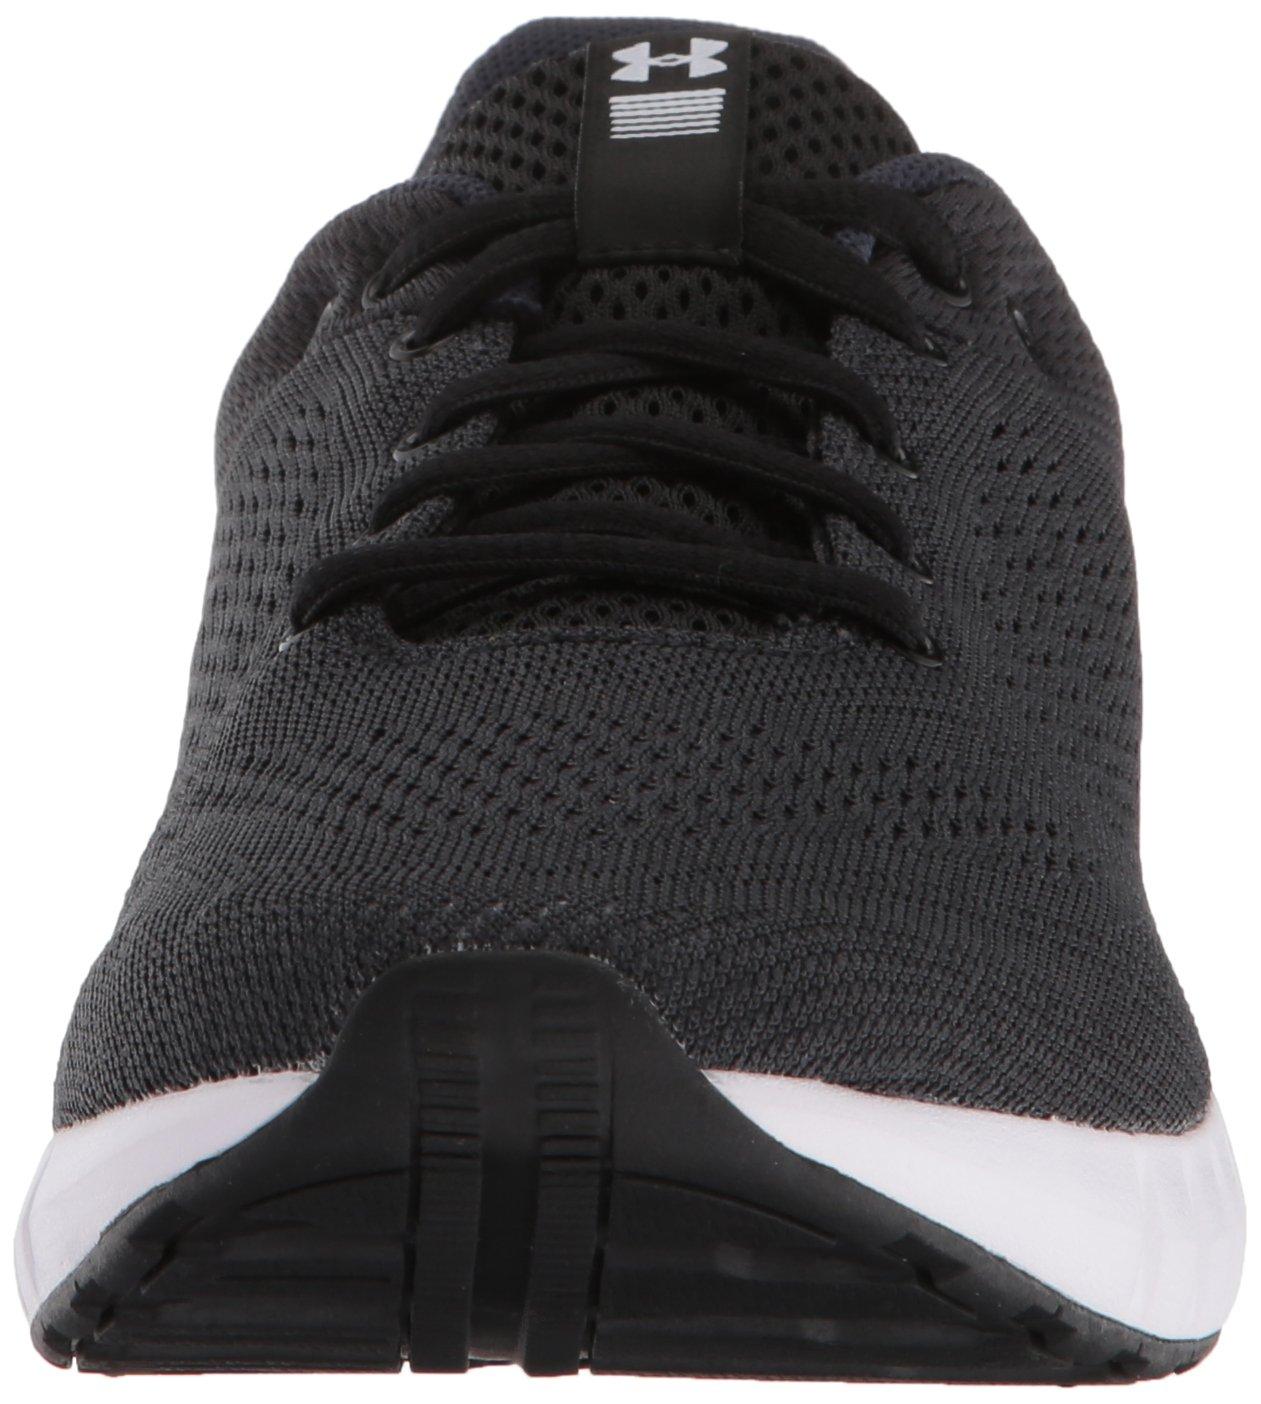 Under Armour Women's Micro G Pursuit Sneaker B071F2BZJL 12 M US|Anthracite (100)/Black